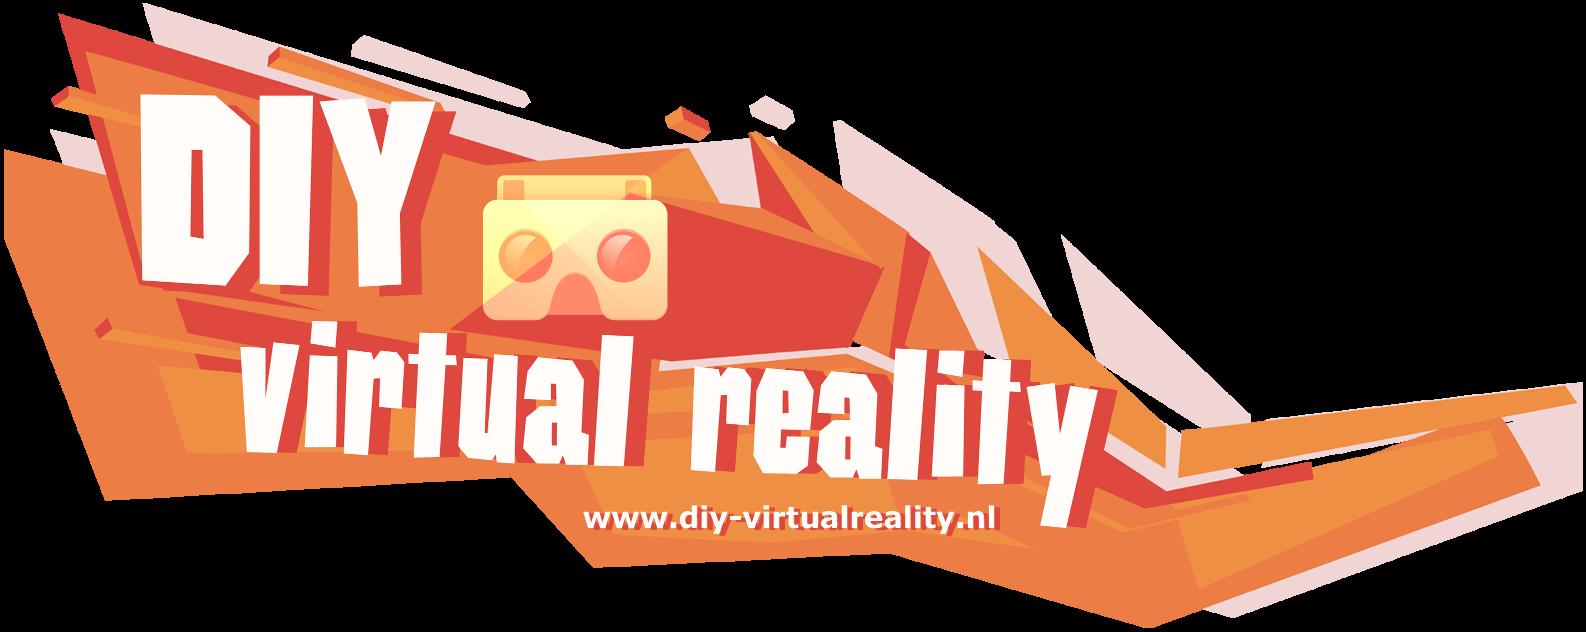 DIY Virtual Reality